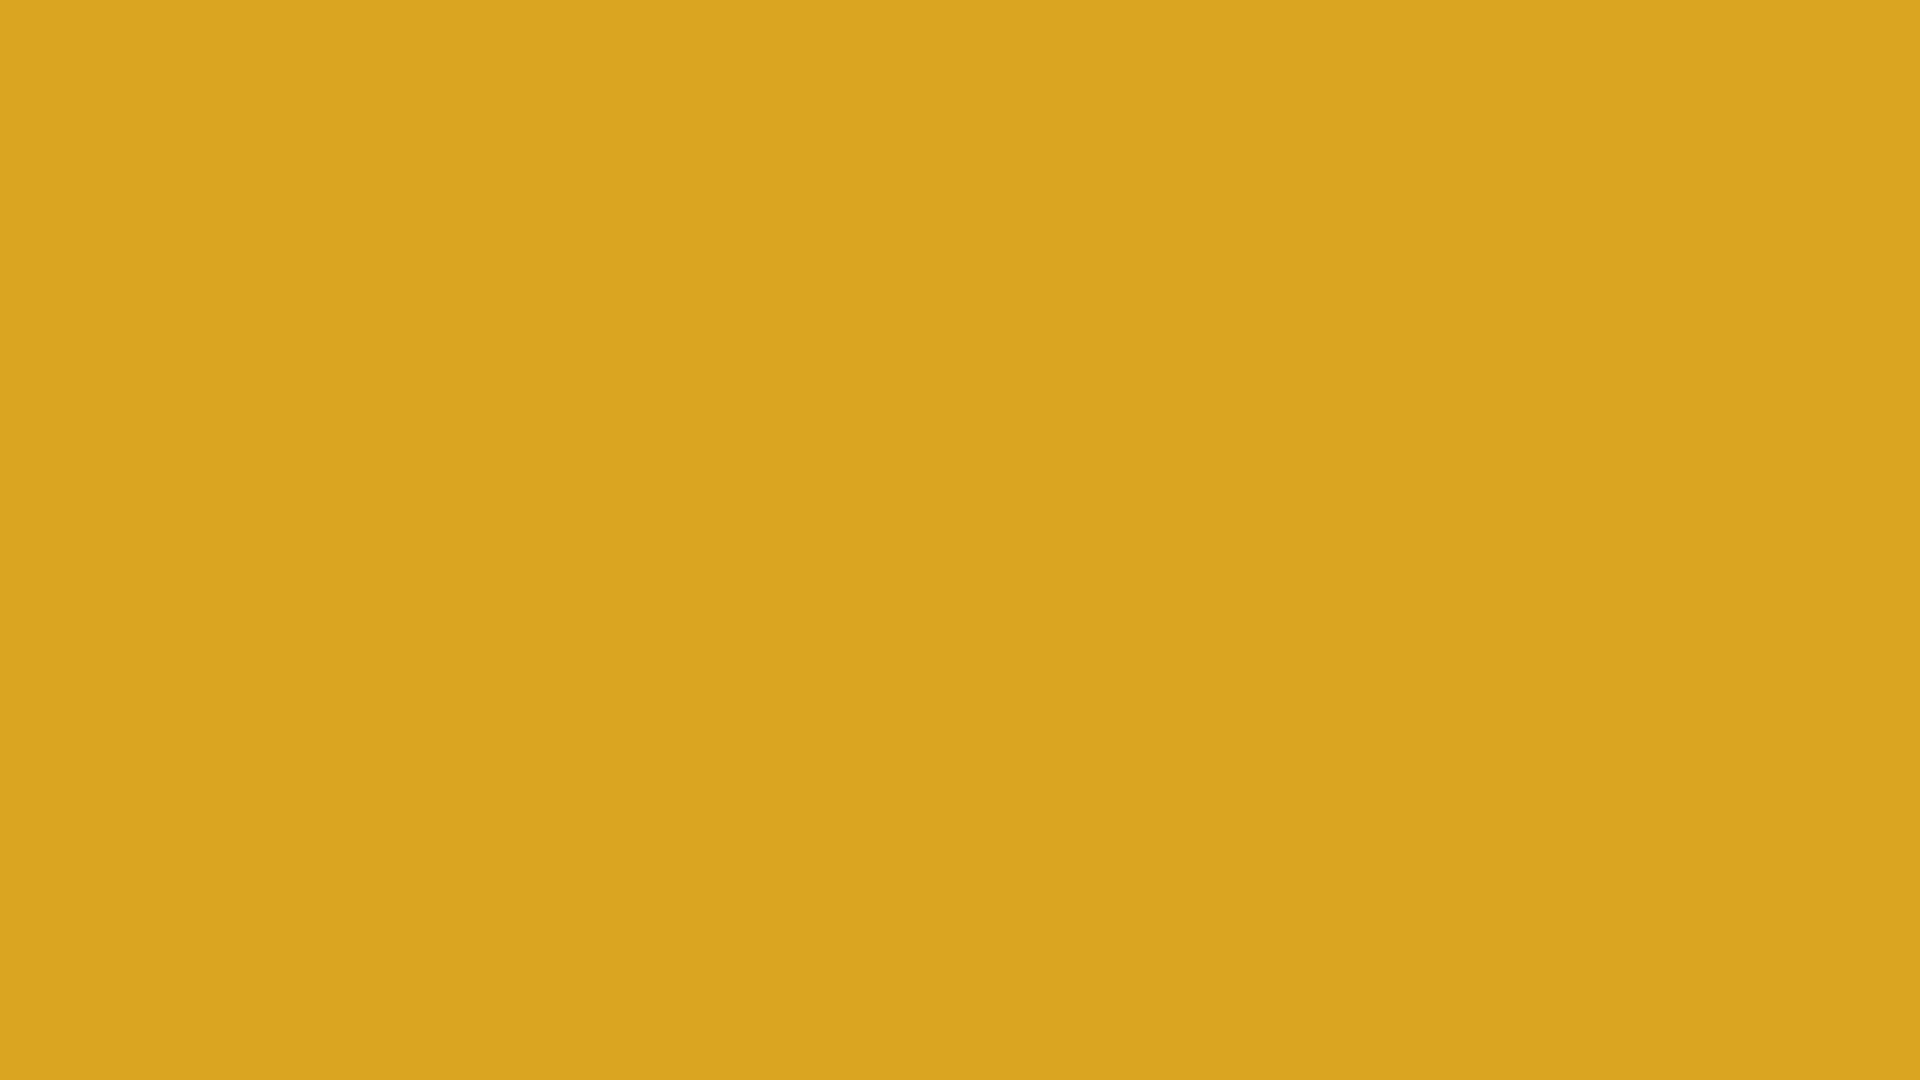 1920x1080 Goldenrod Solid Color Background